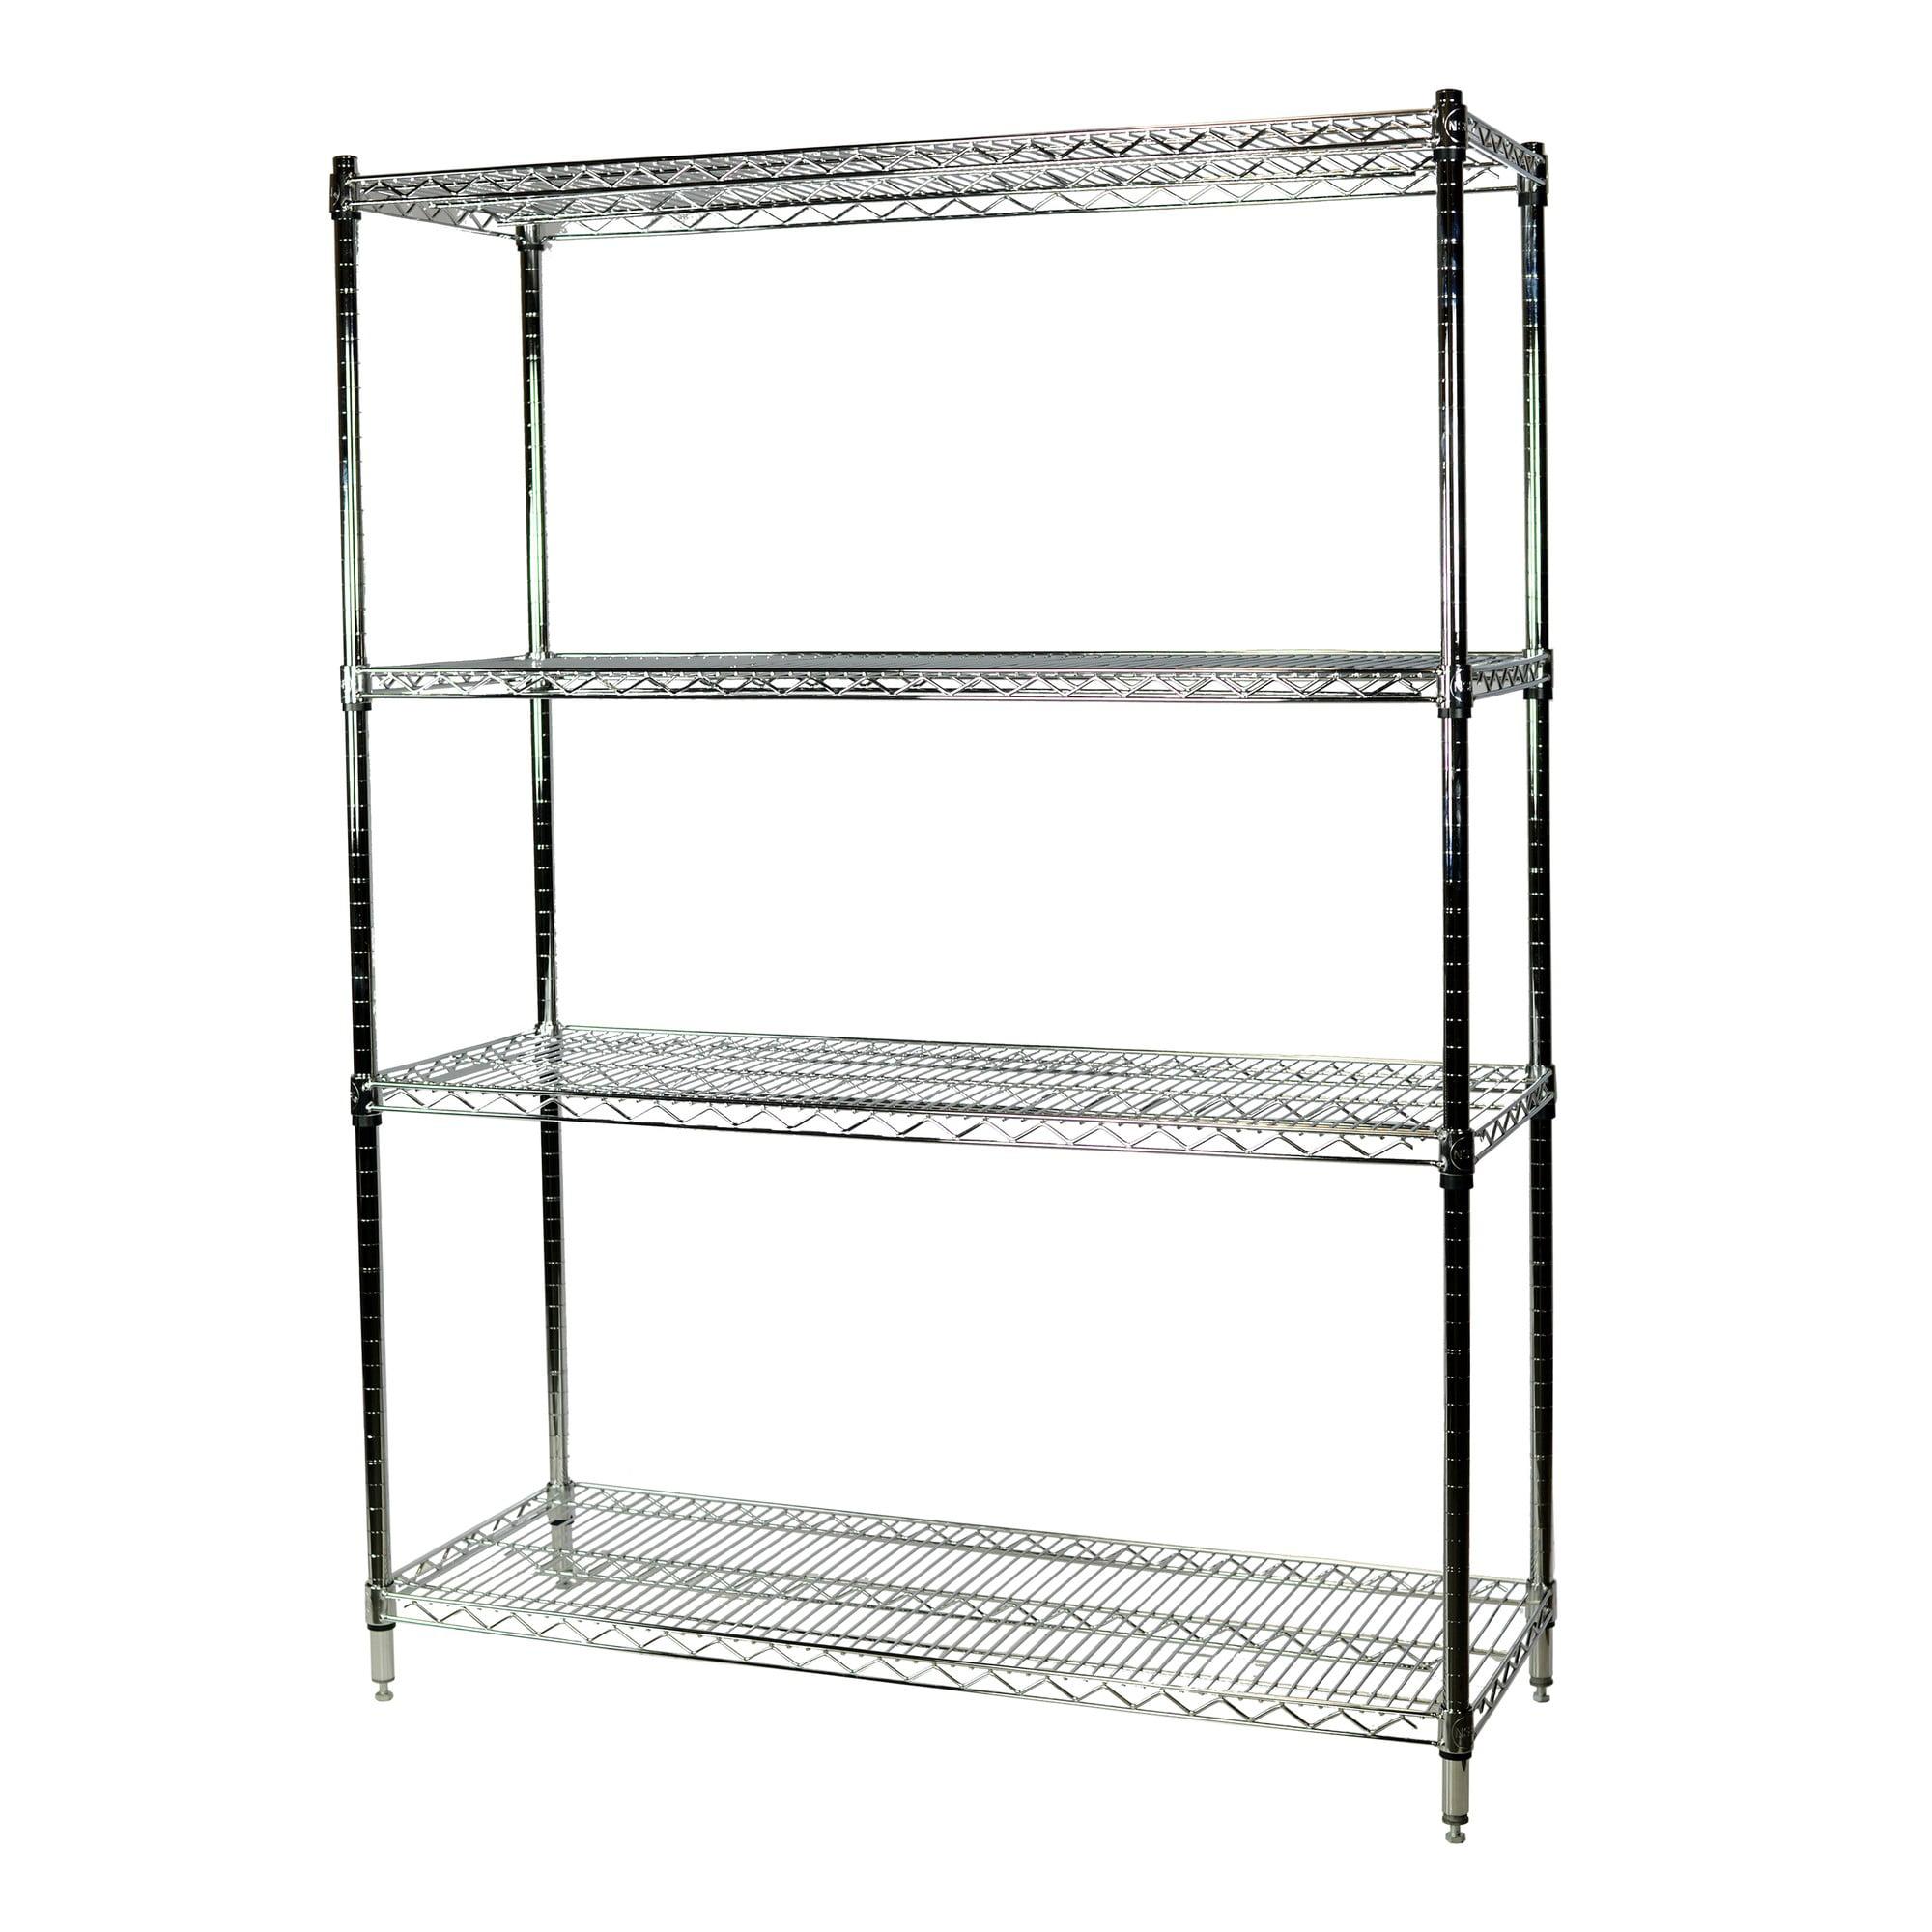 Storage Max Chrome Wire Shelving Unit, 18 x 36 x 74, 4 Shelves